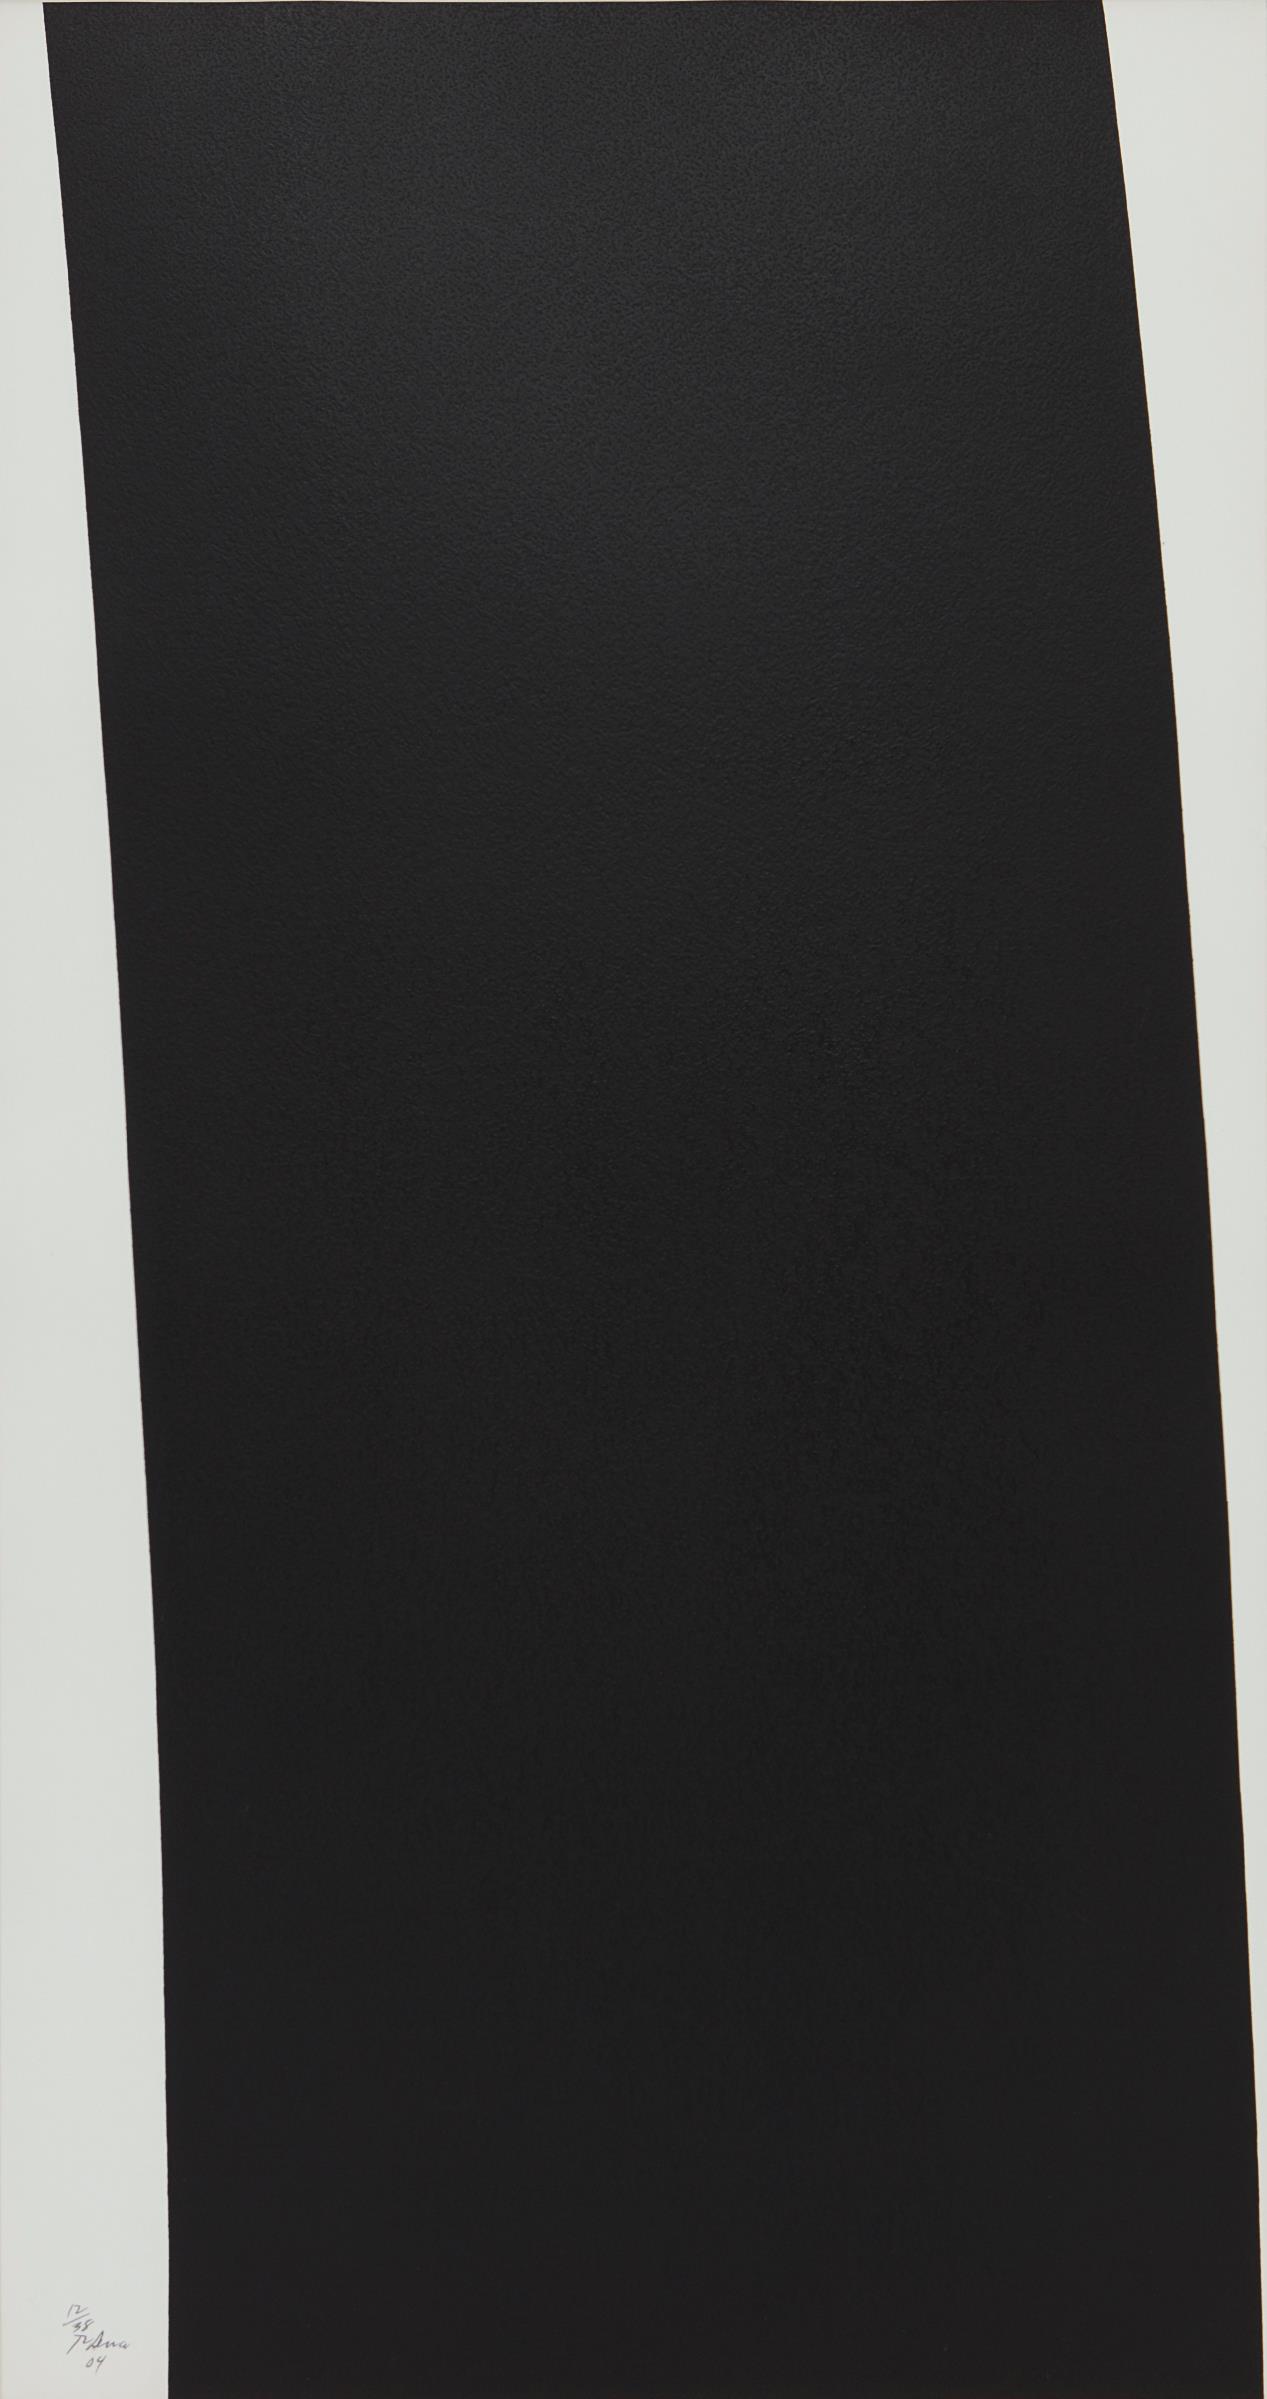 Richard Serra-Transversal I-2004